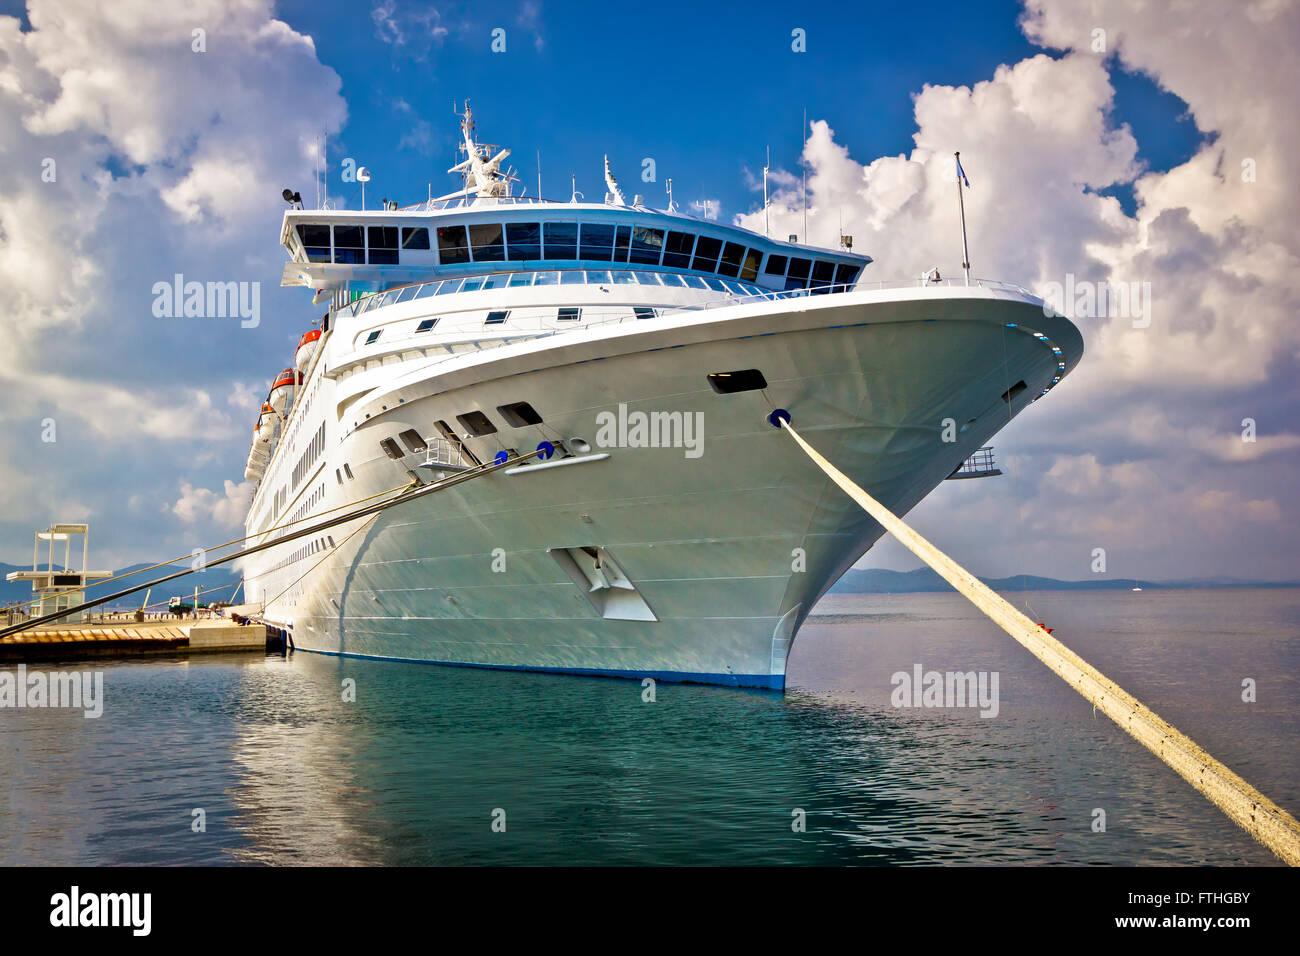 Big Docked Cruise Ship View In Zadar Croatia Stock Photo Royalty - Docked cruise ship